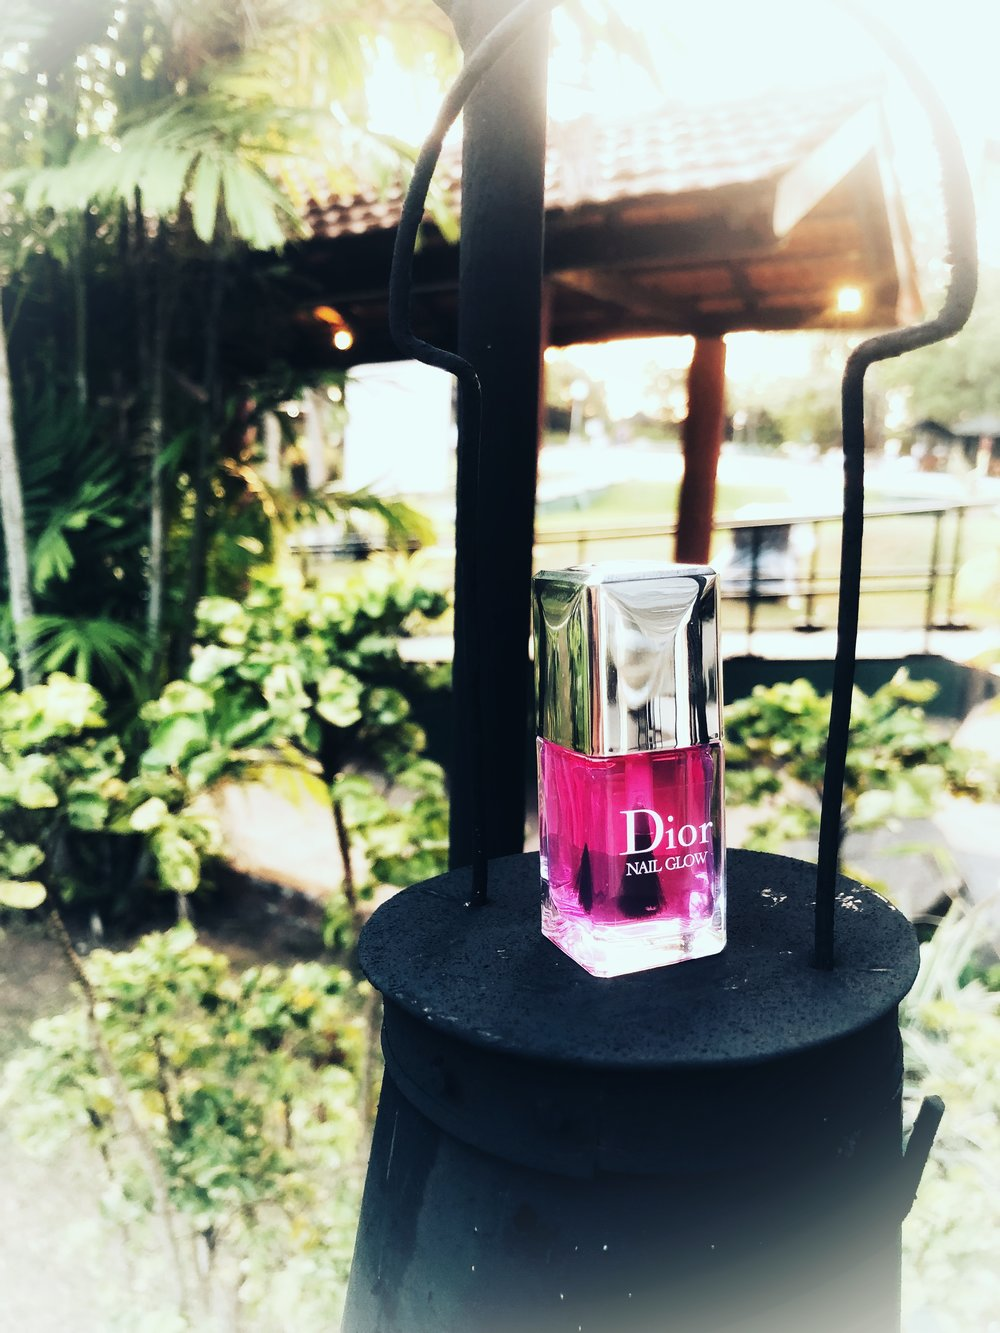 Dior Nail Glow — The Purple Window